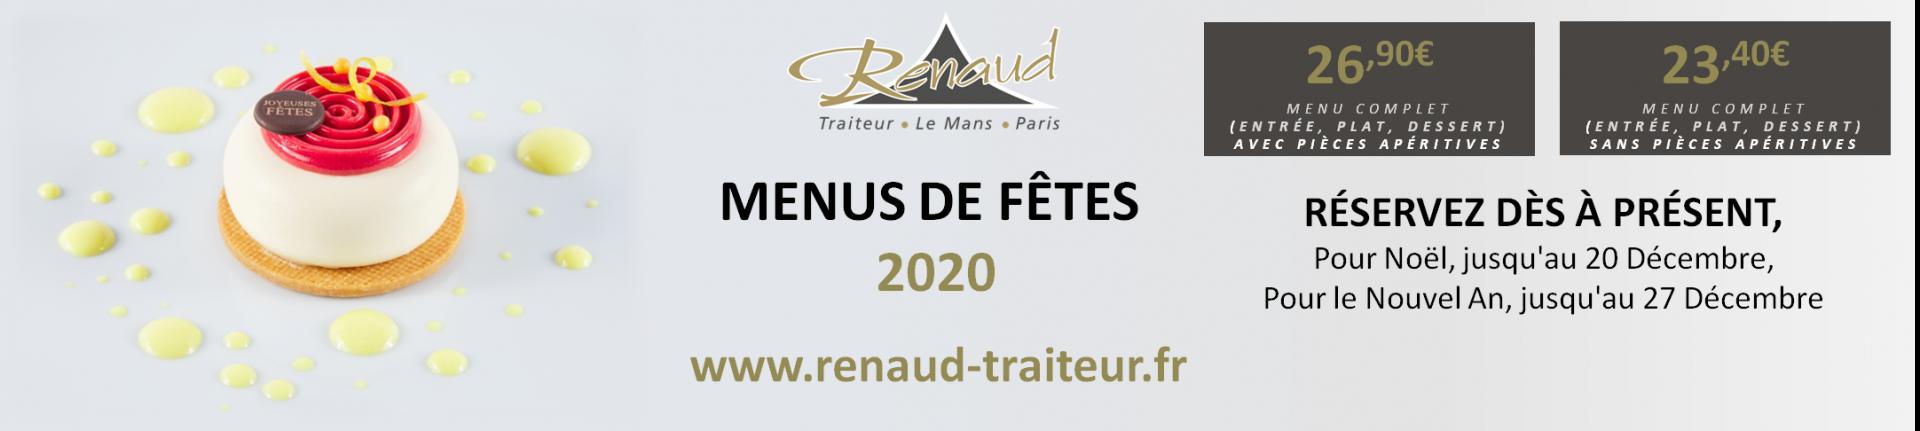 MENUS DE FÊTES 2020